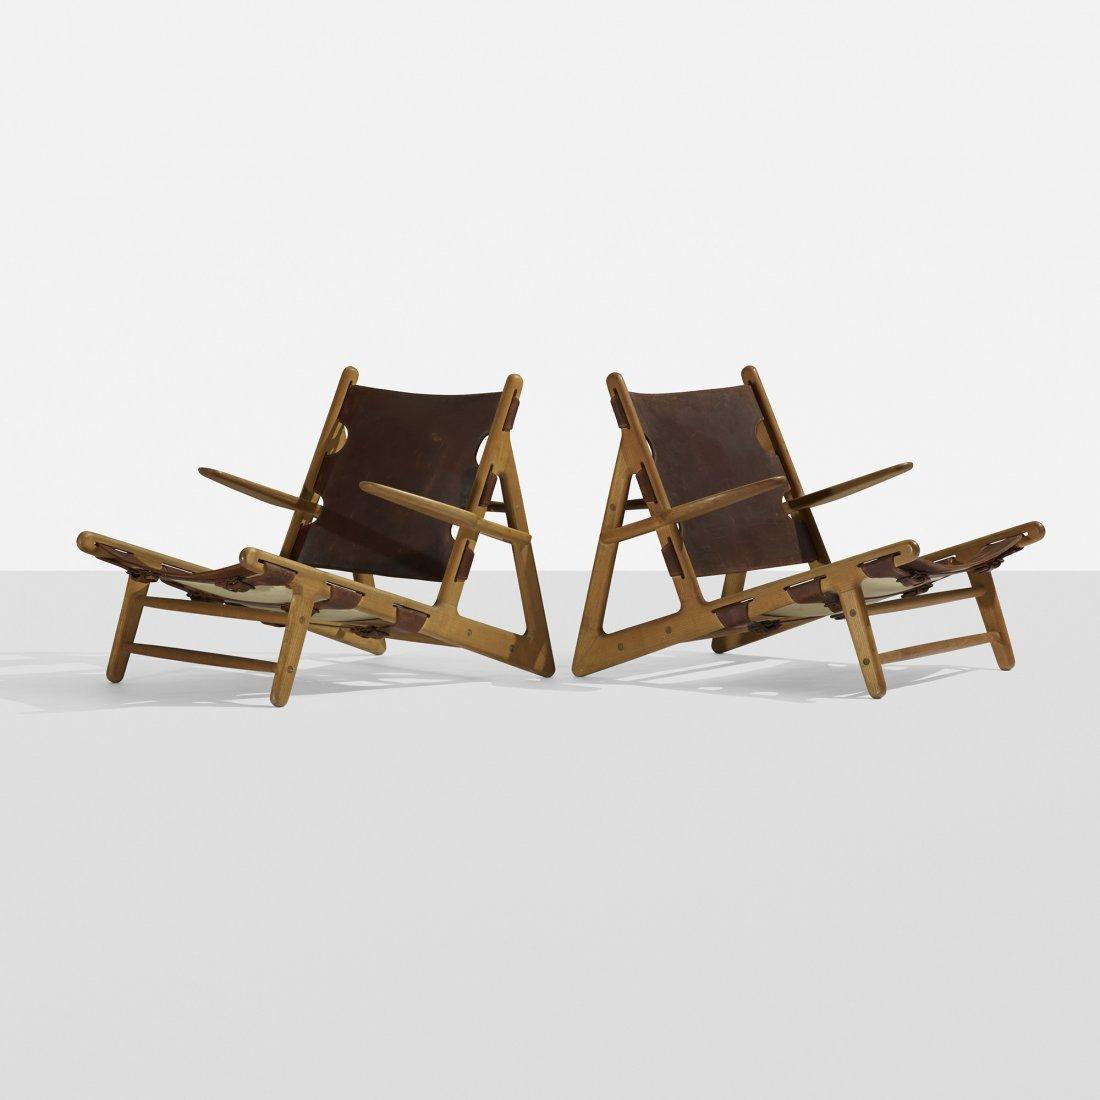 Børge Mogensen Hunting chairs, pair